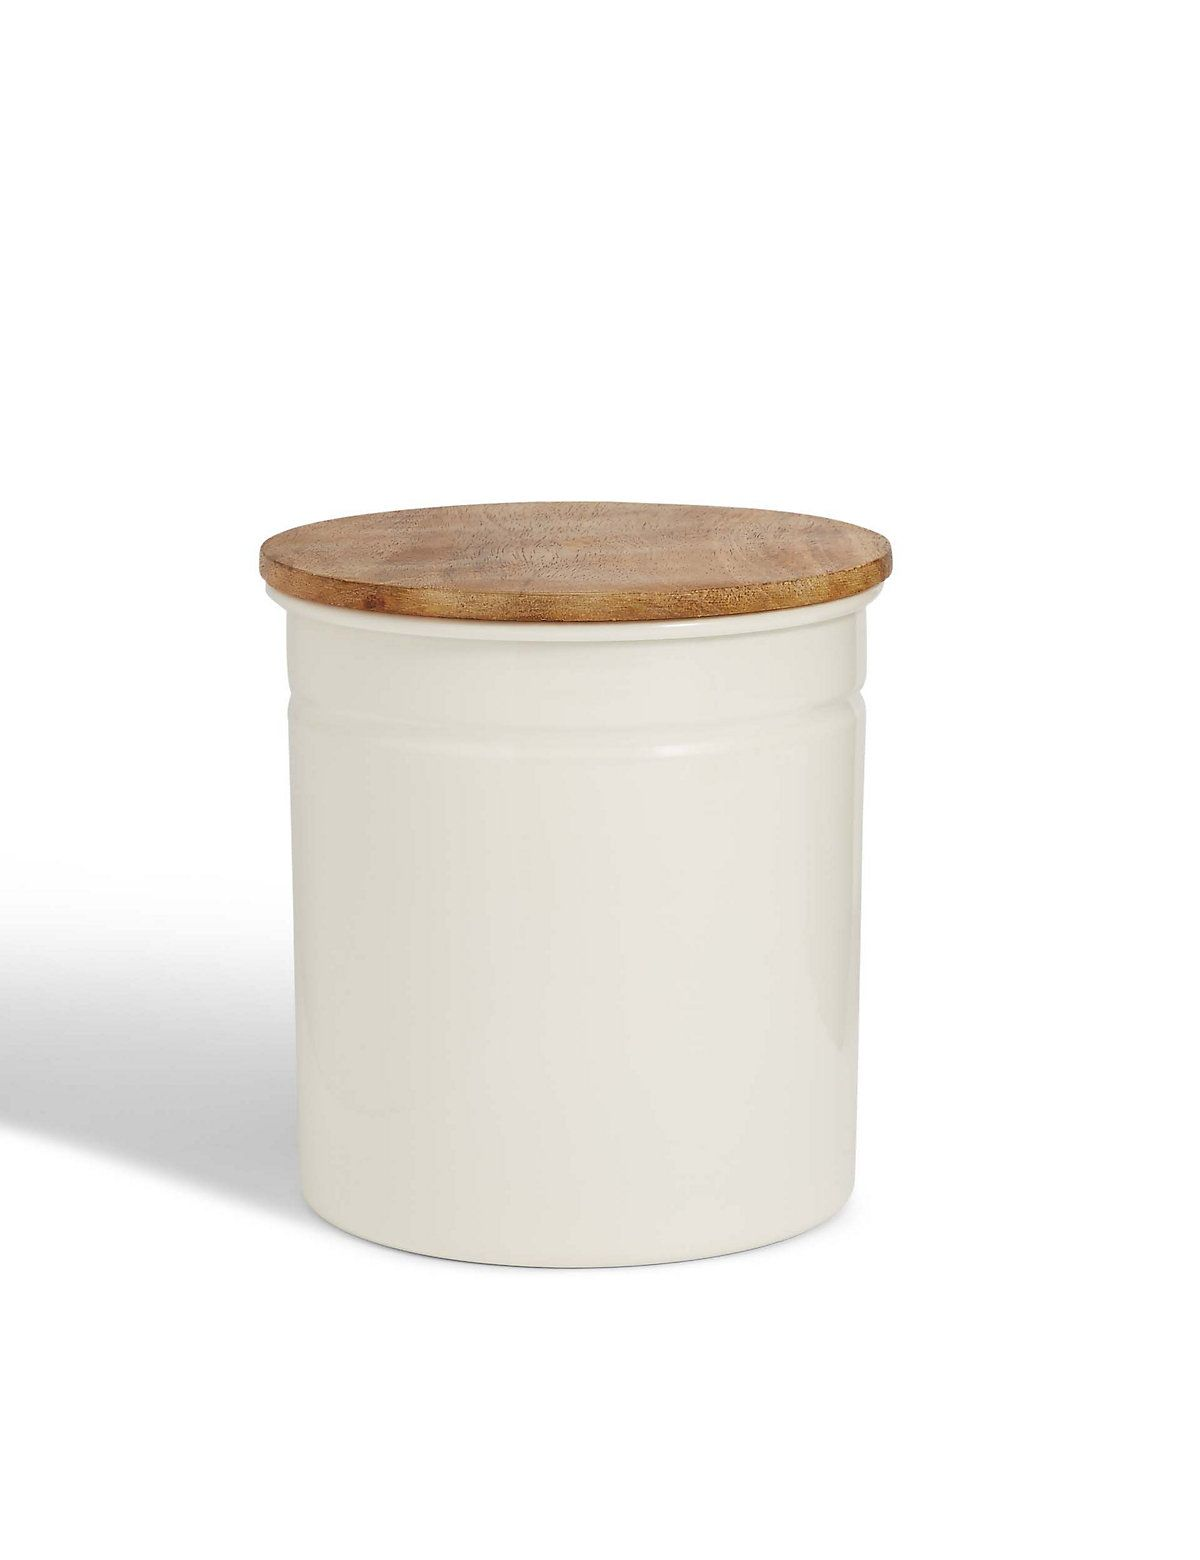 Powder Coated Storage Biscuit Tin